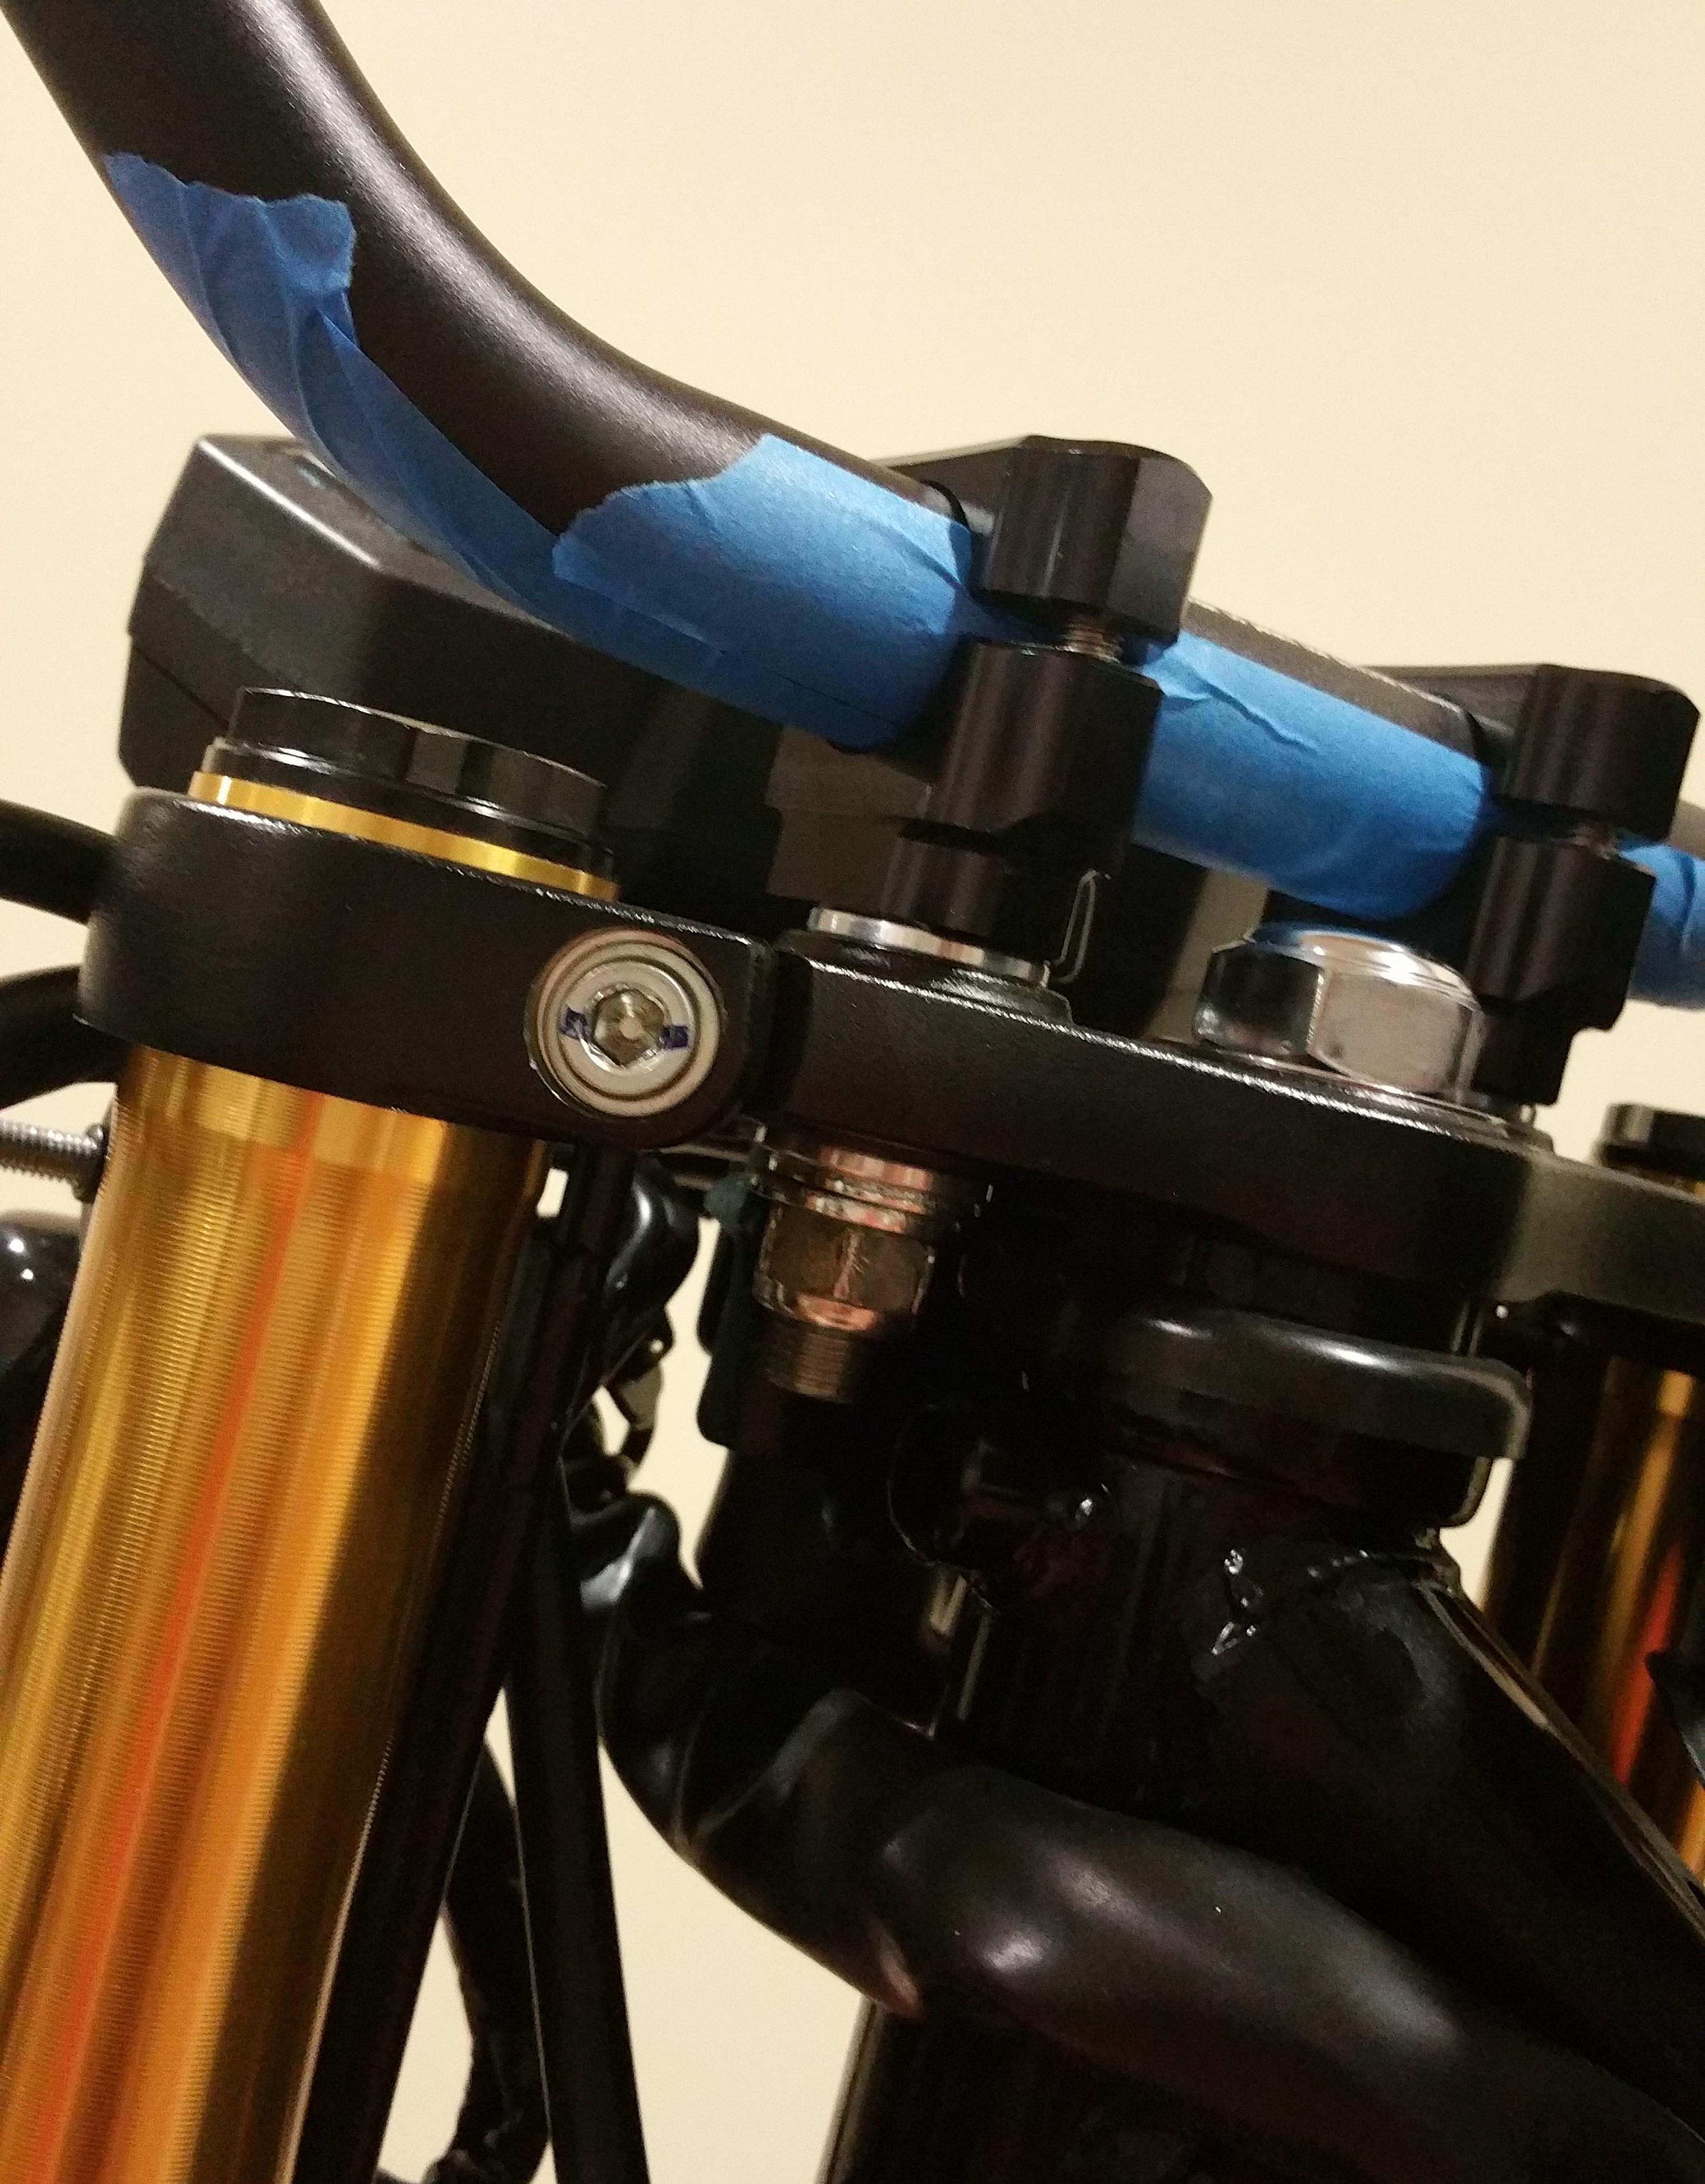 KTM 125 SX 2002 RFX Pro Series Sprockets 13T//50T and DID ERT3 Gold Chain Kit Set